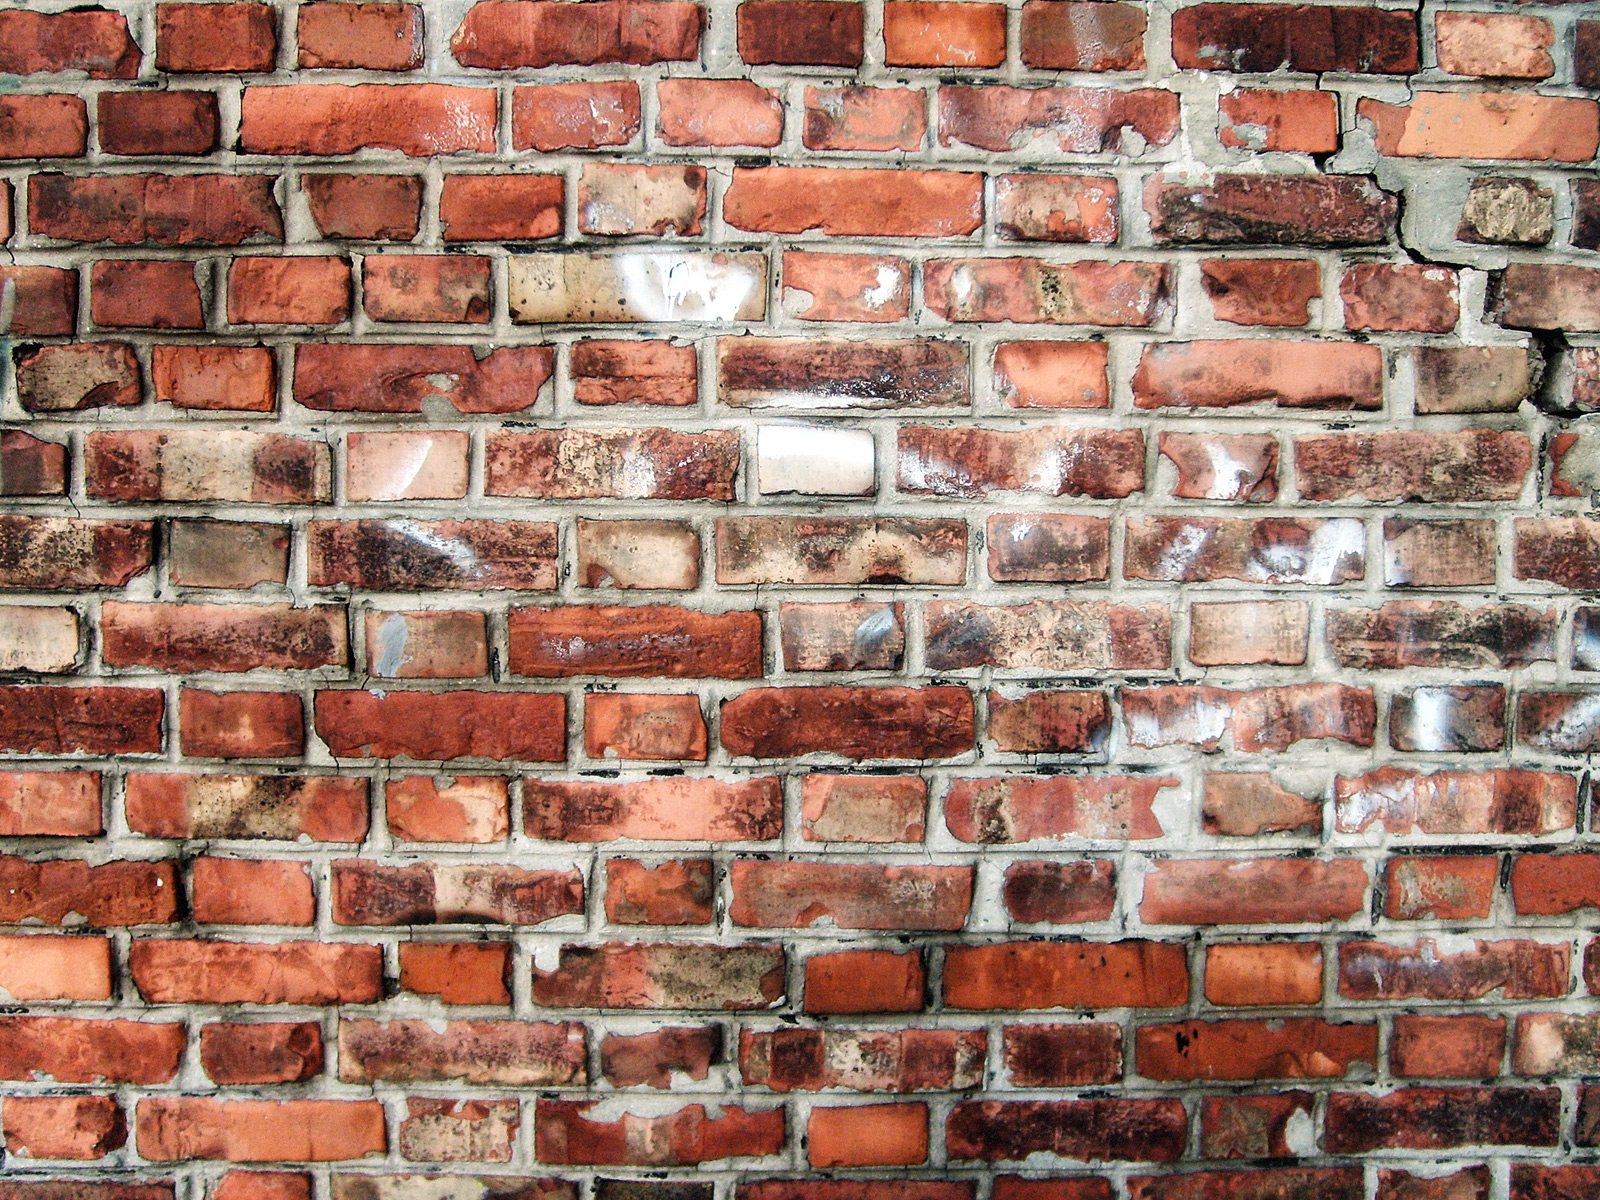 Brick Wallpapers, Fine HDQ Brick Photos | Beautiful HDQ Wallpapers